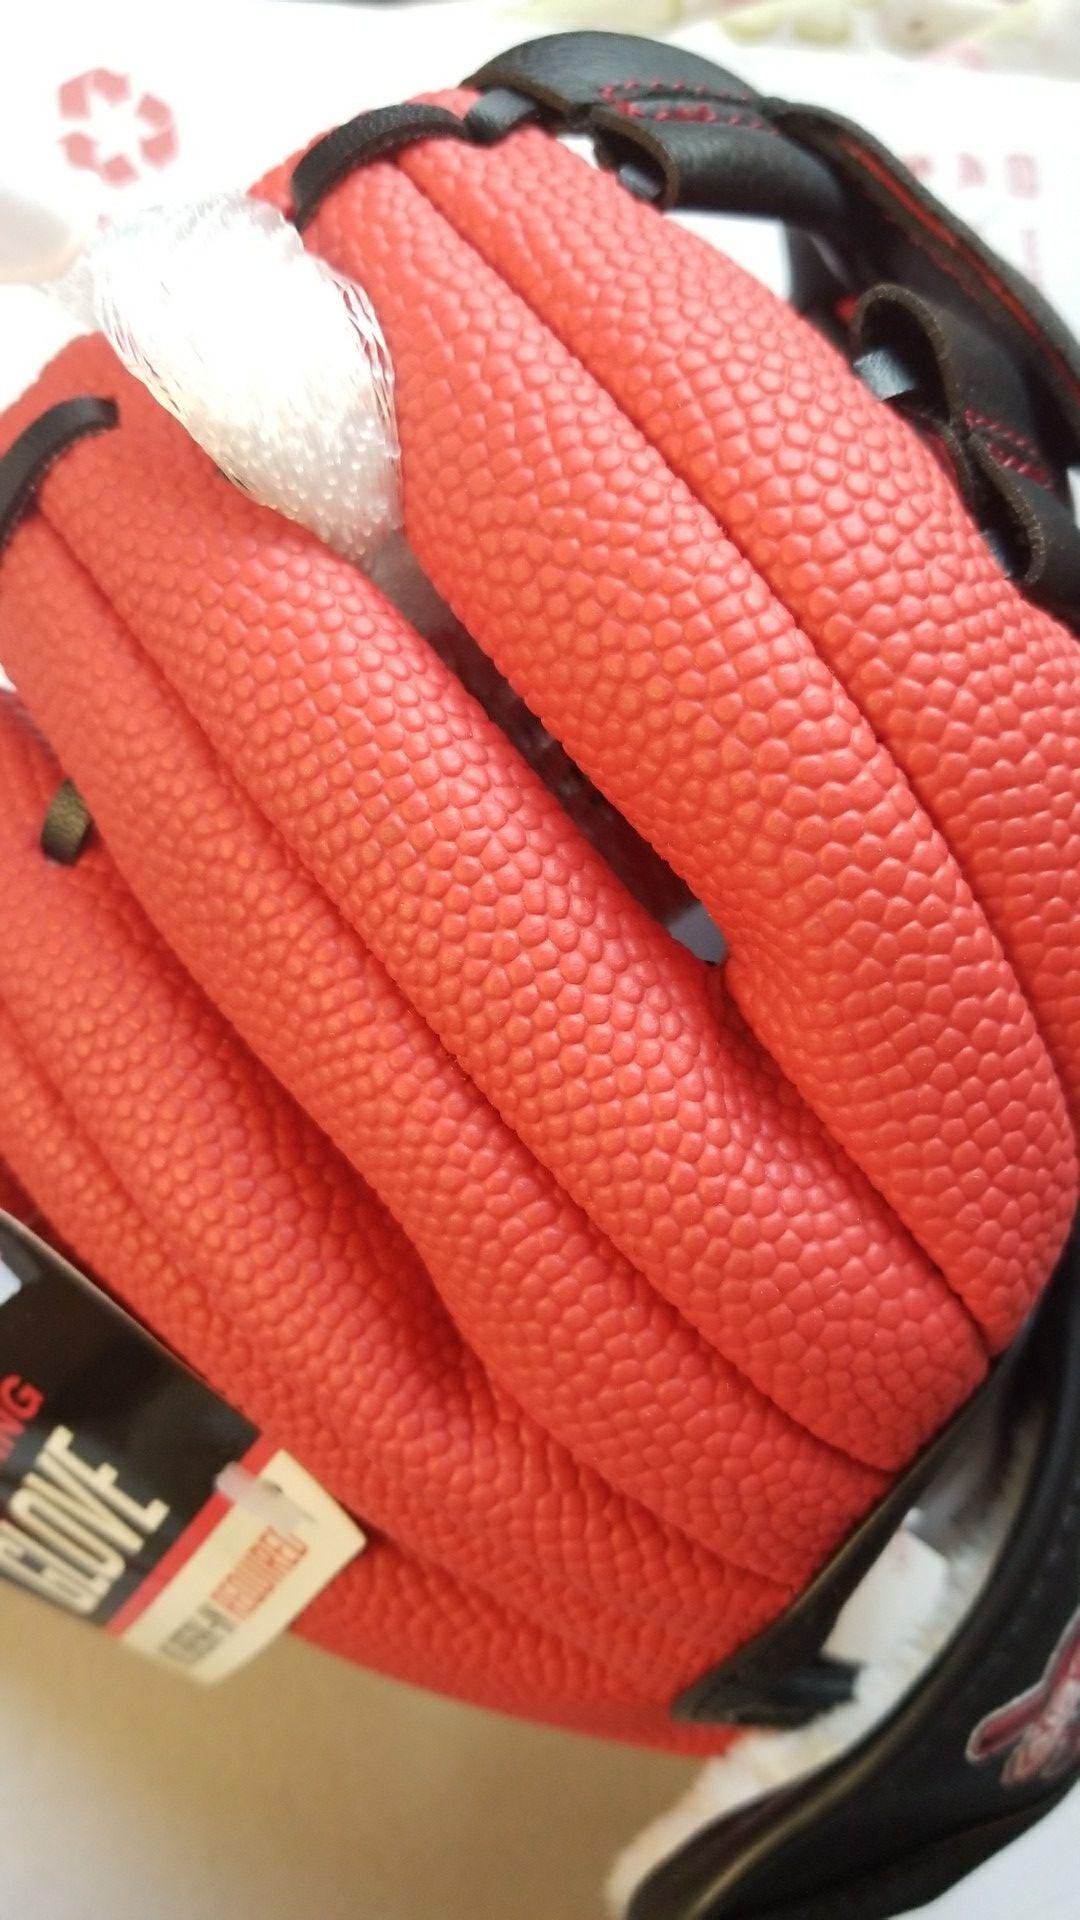 "Franklin 8.5"" Teeball Fielding Glove Air Tech Sports"